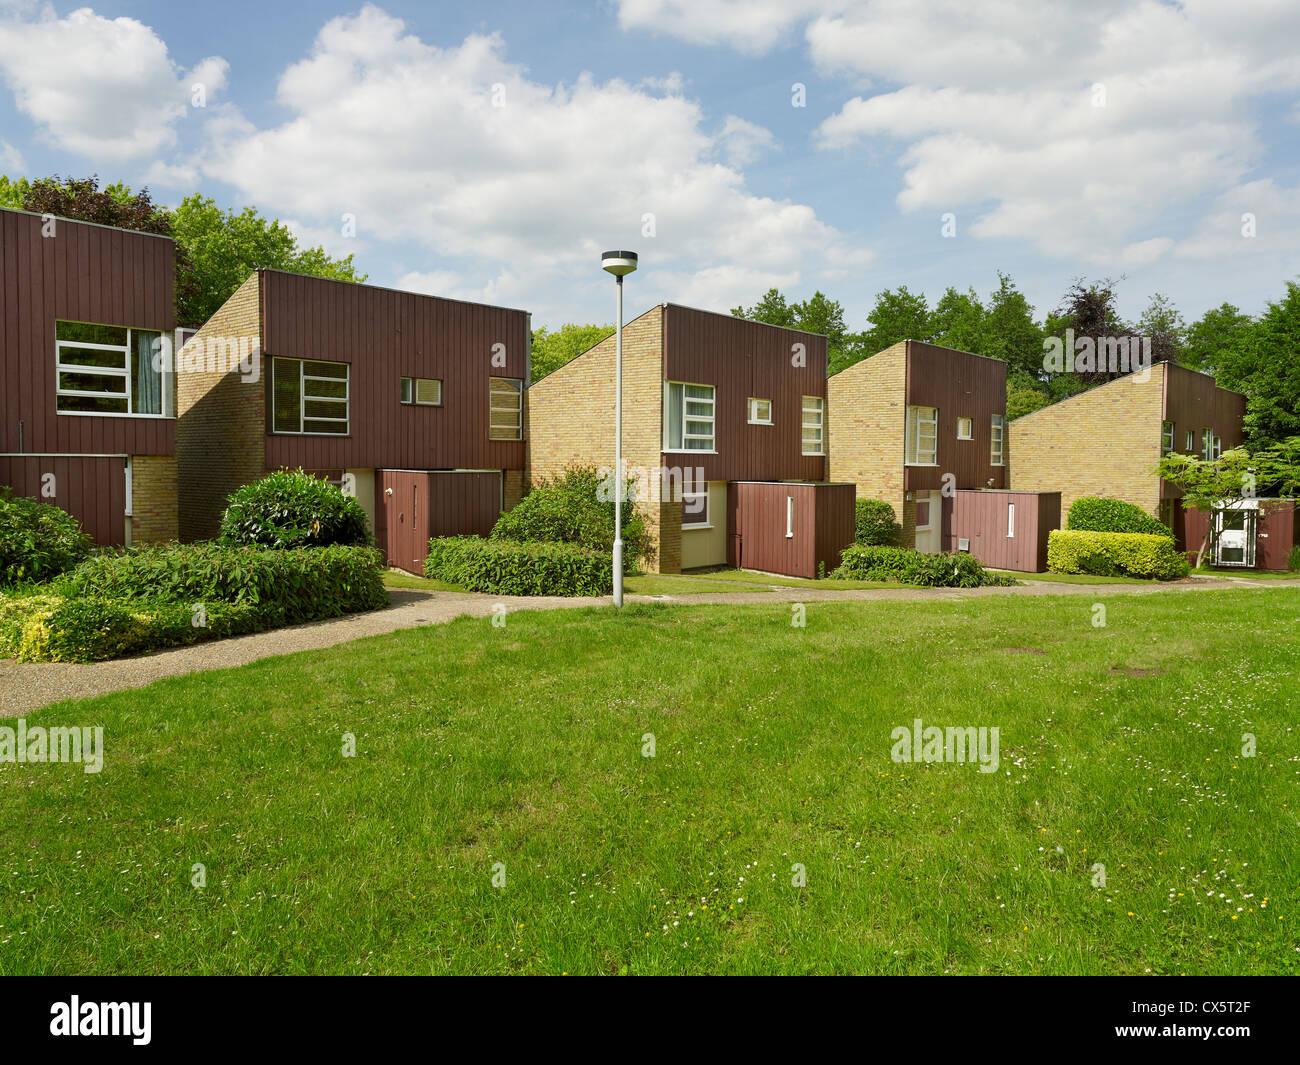 New Ash Green, Kent. Knights Croft - Stock Image